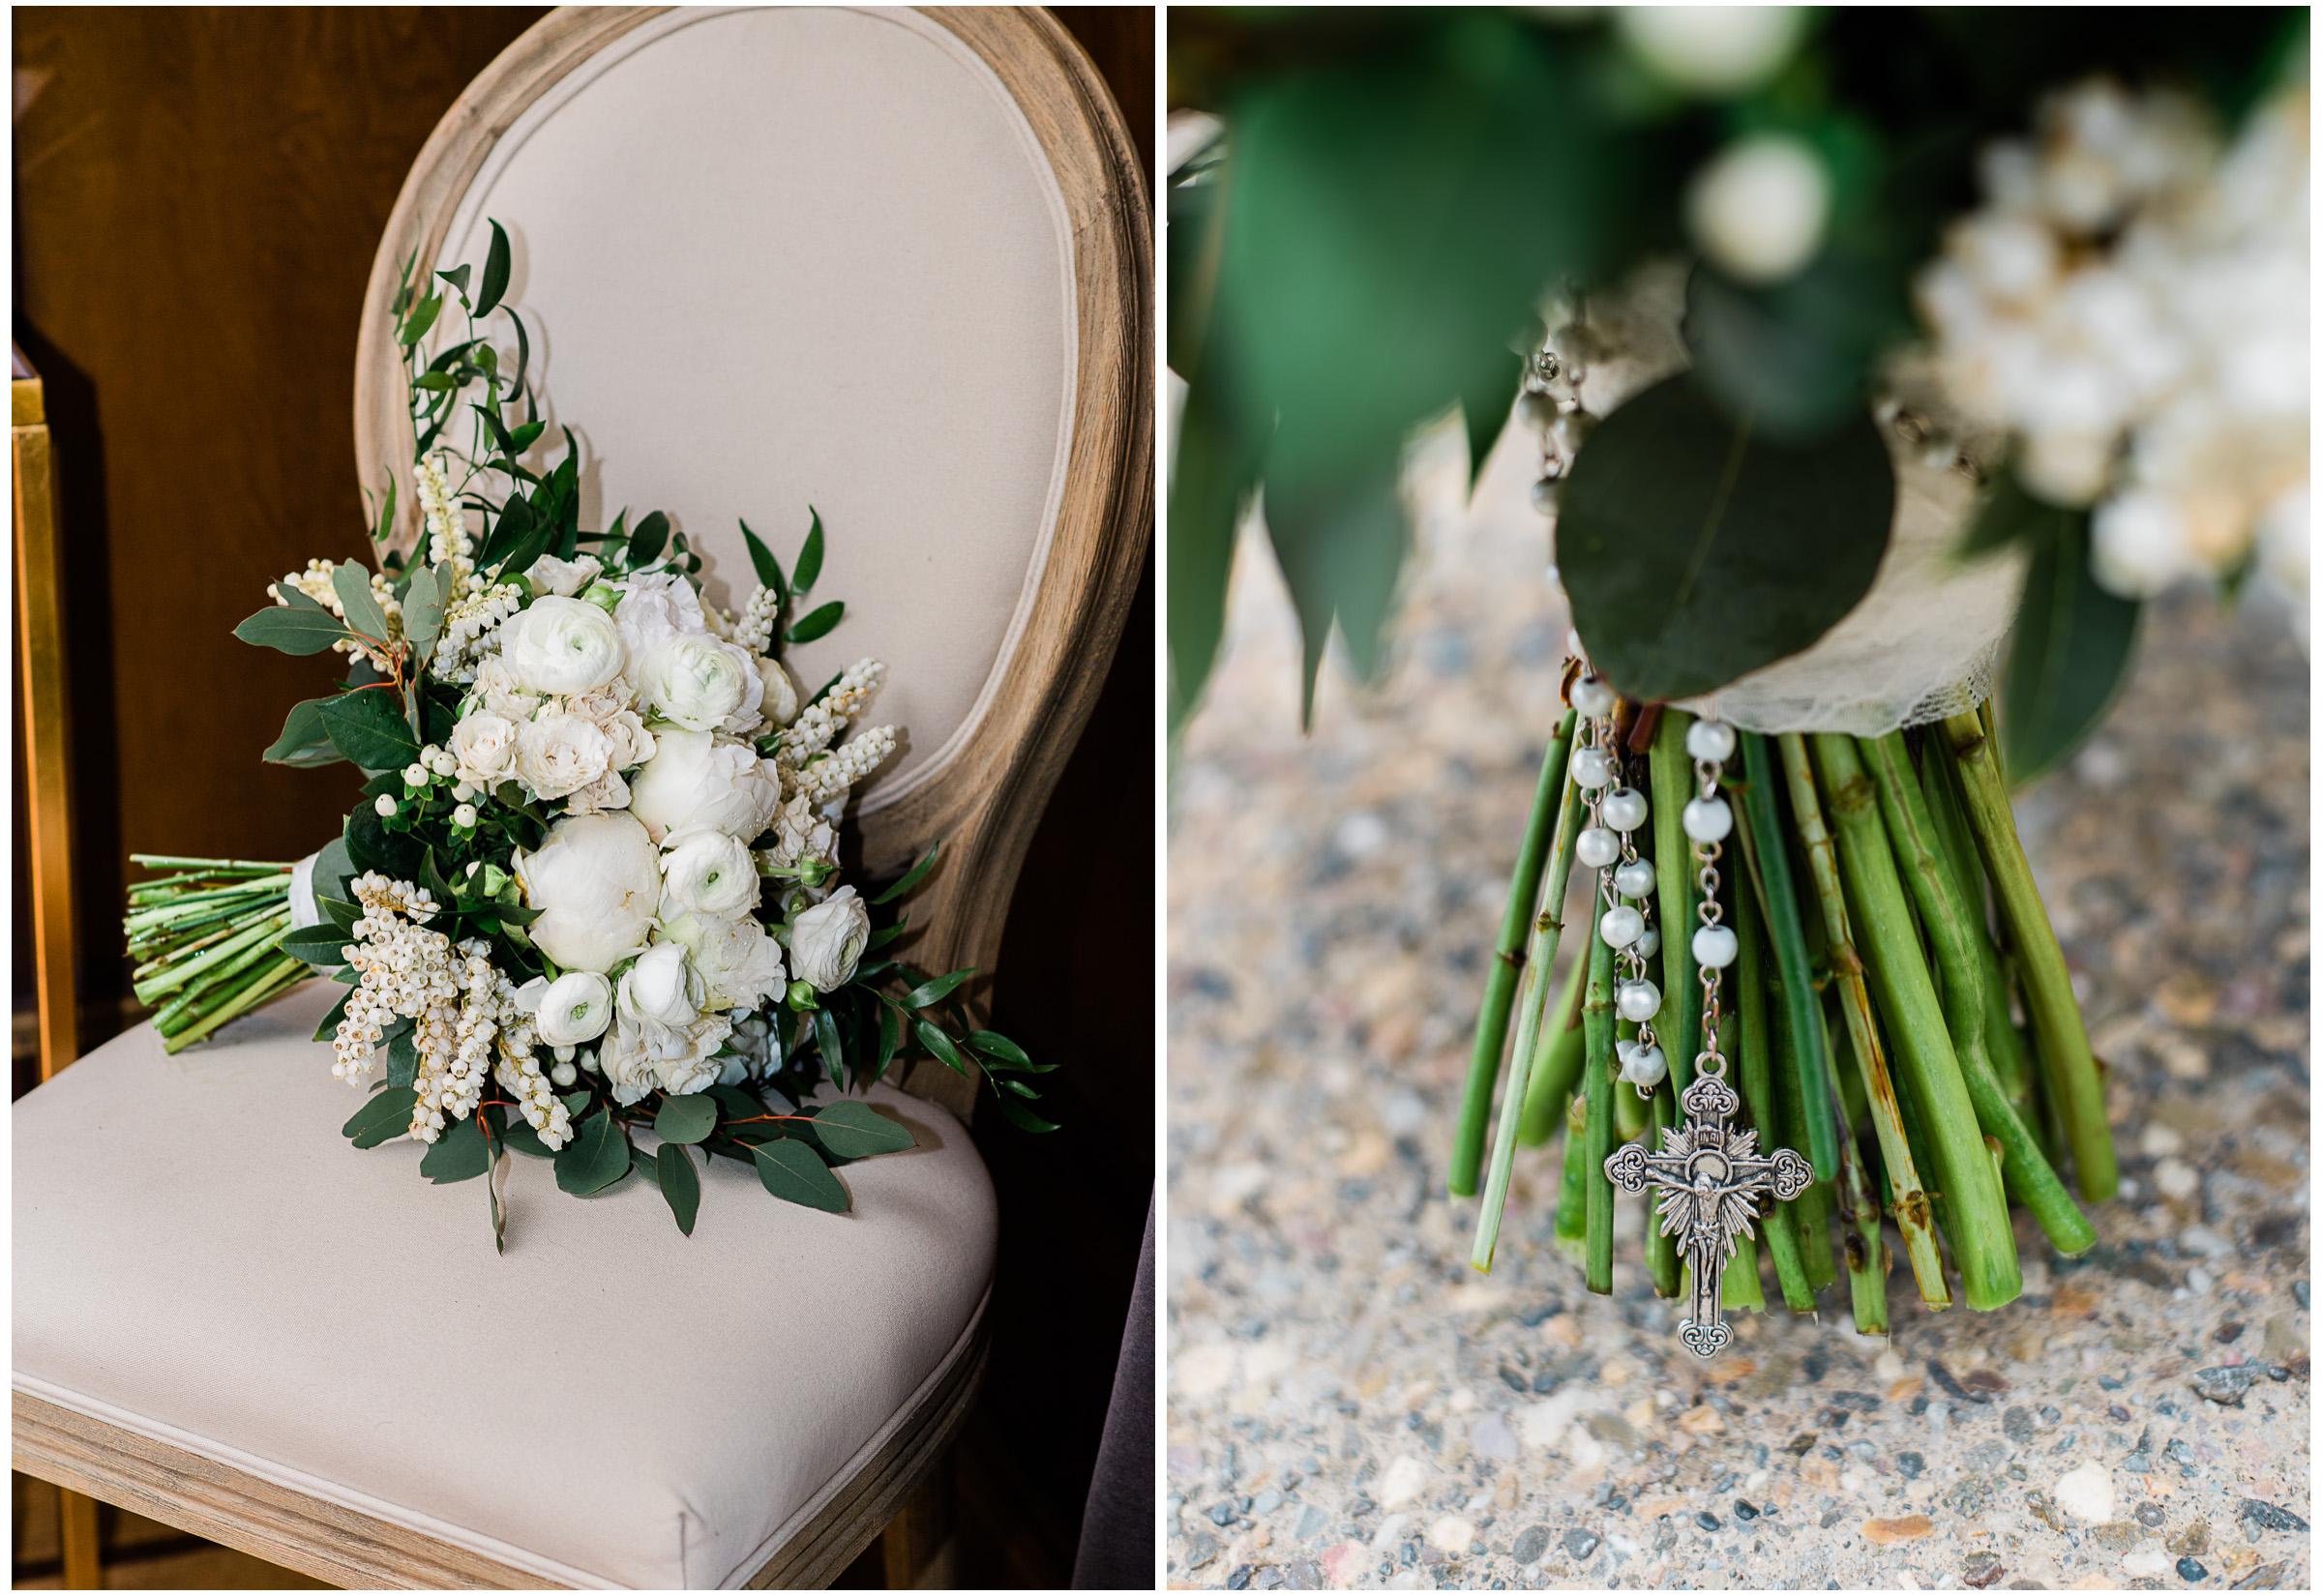 Winters Wedding - Sacramento Photographer - Field & Pond - Justin Wilcox Photography - 2.jpg